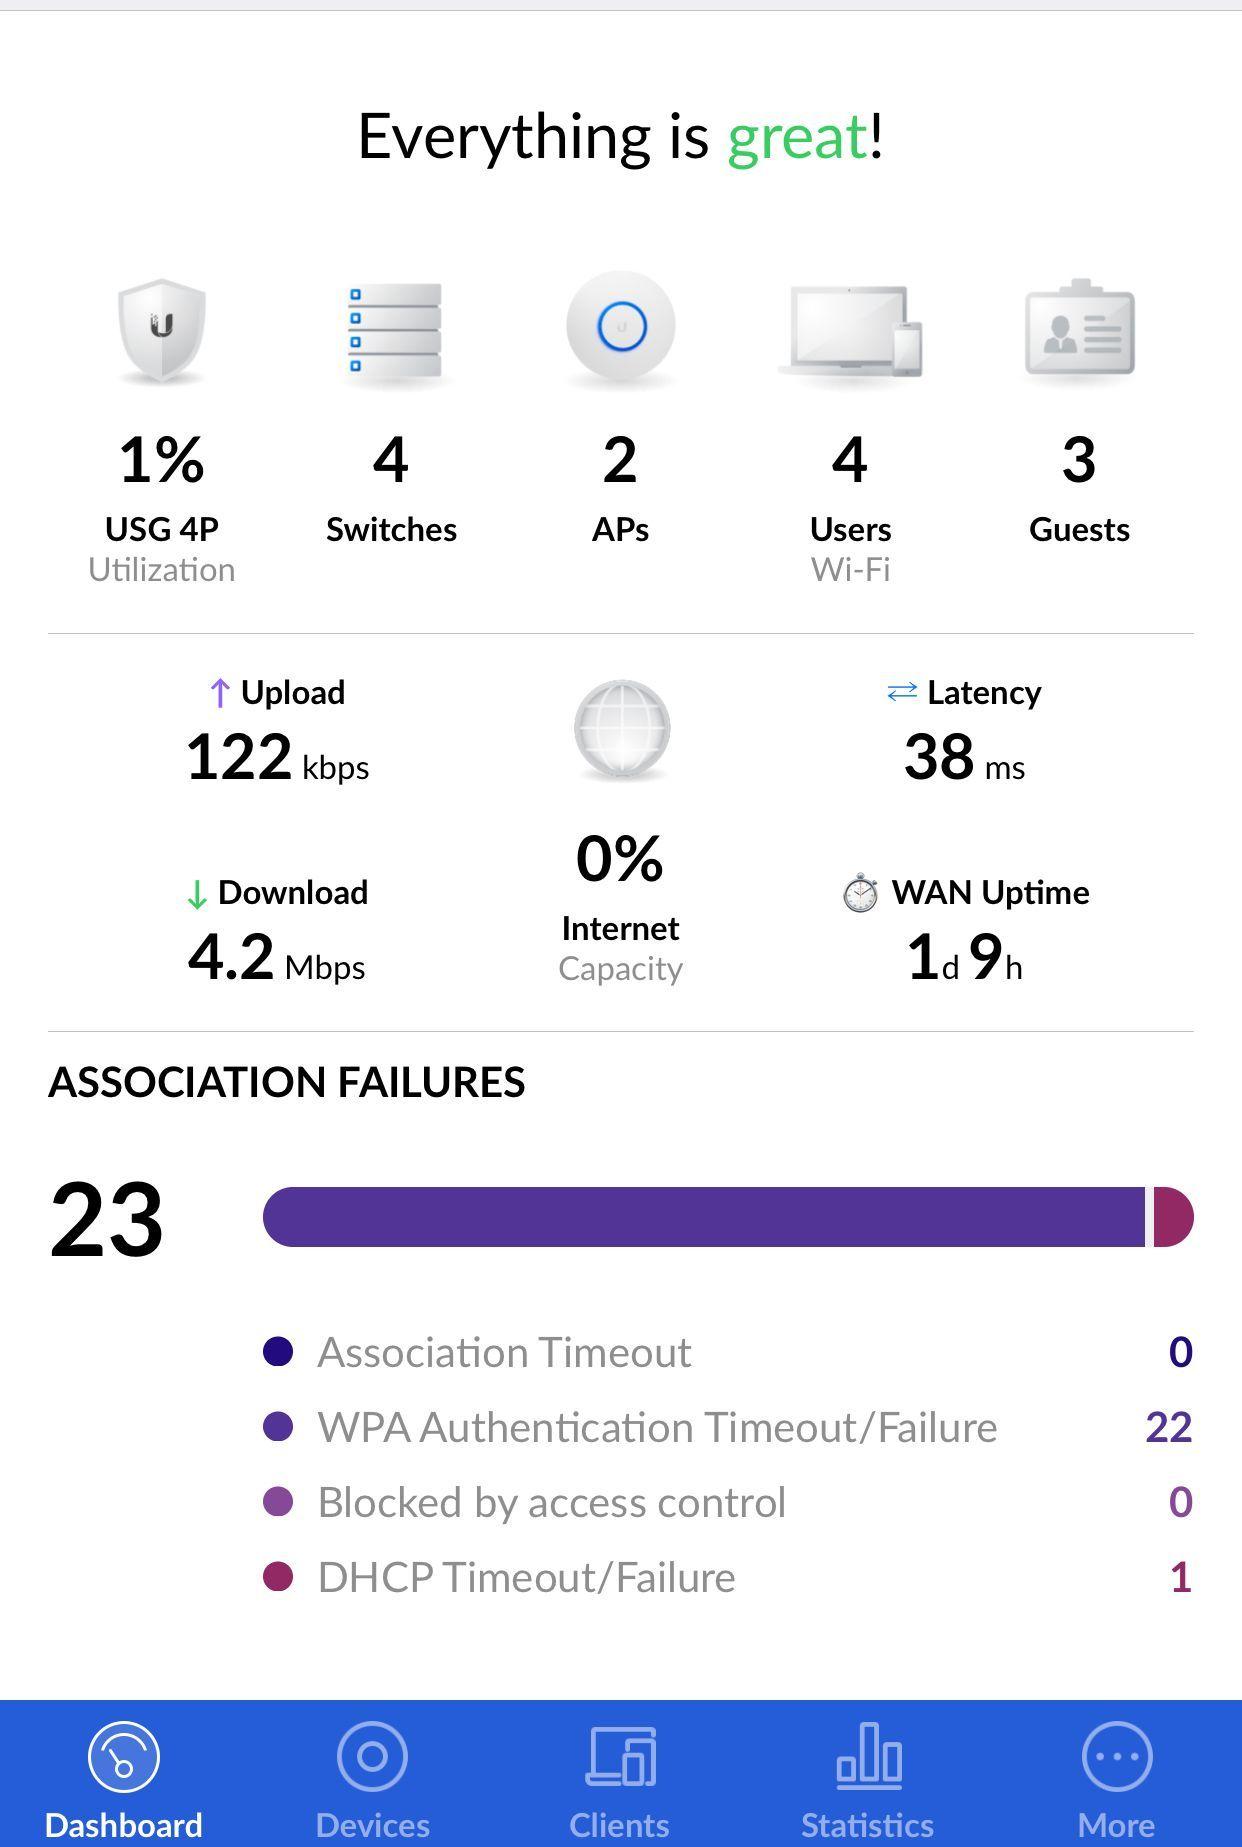 Association Failures - WPA Authentication Timeout/Failure